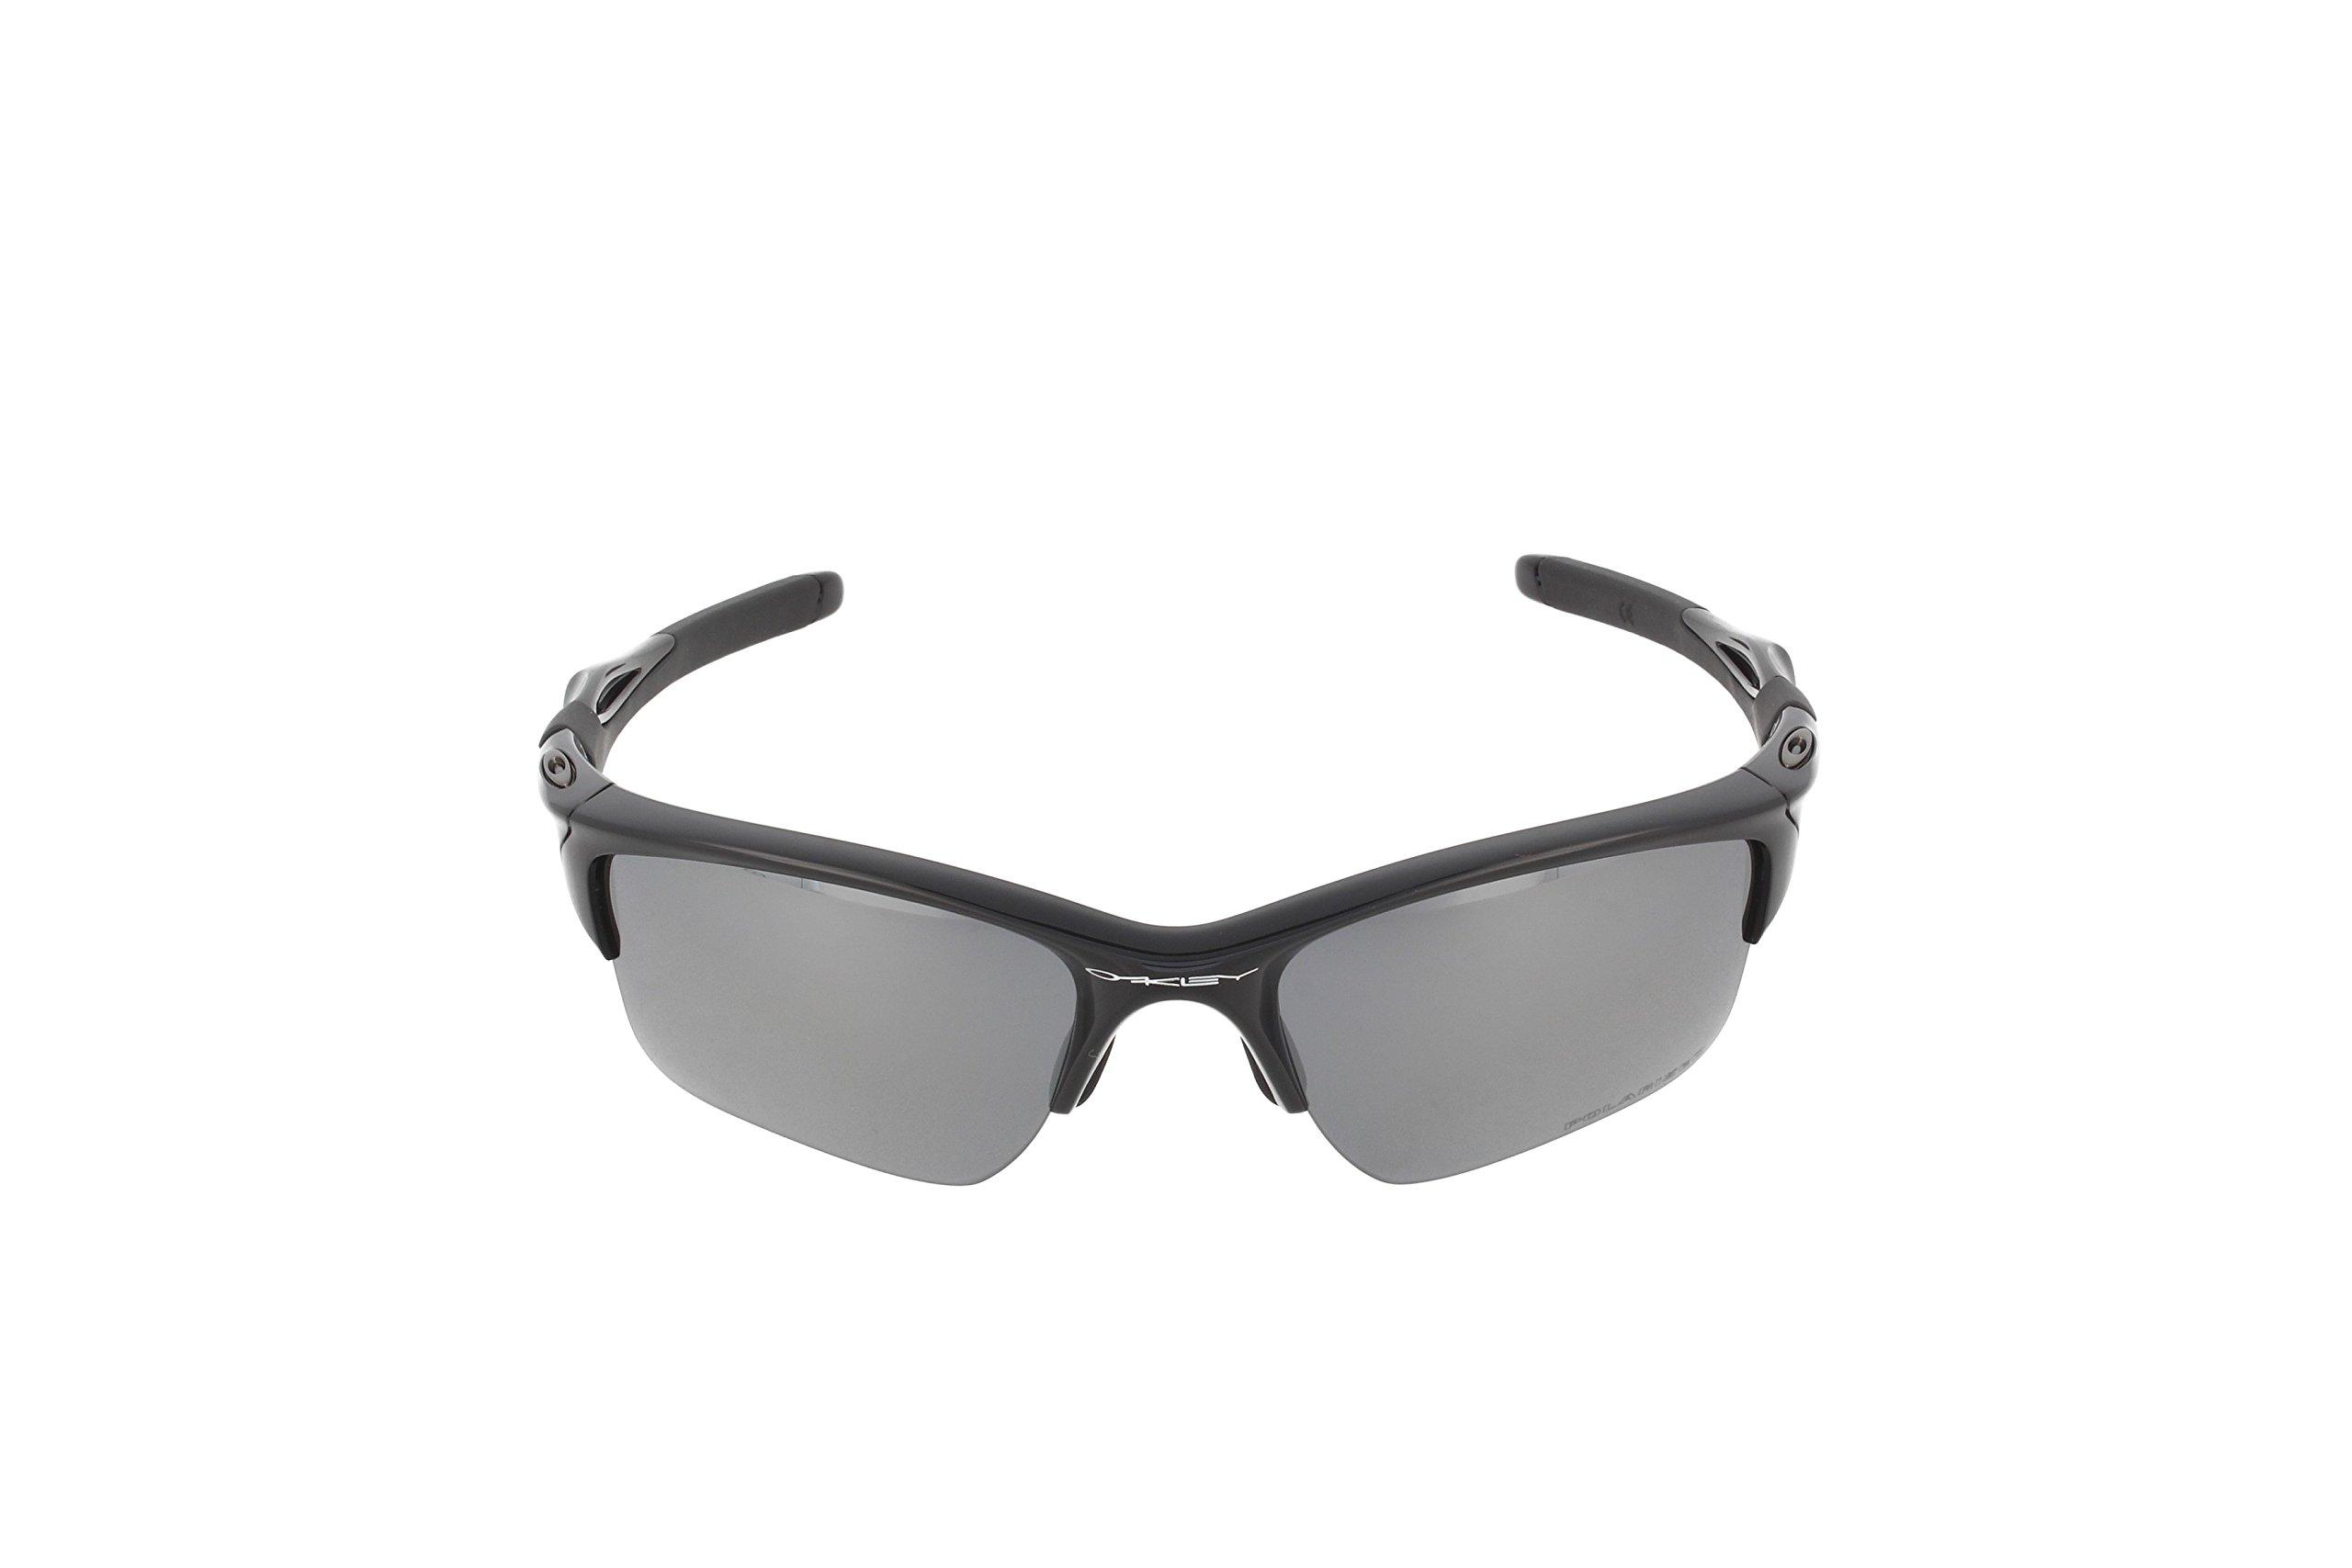 Oakley Mens Half Jacket 2.0 XL OO9154-05 Polarized Sunglasses 58mm, Polished Black Frame/Black Iridium Polarized Lens, 62 mm by Oakley (Image #2)